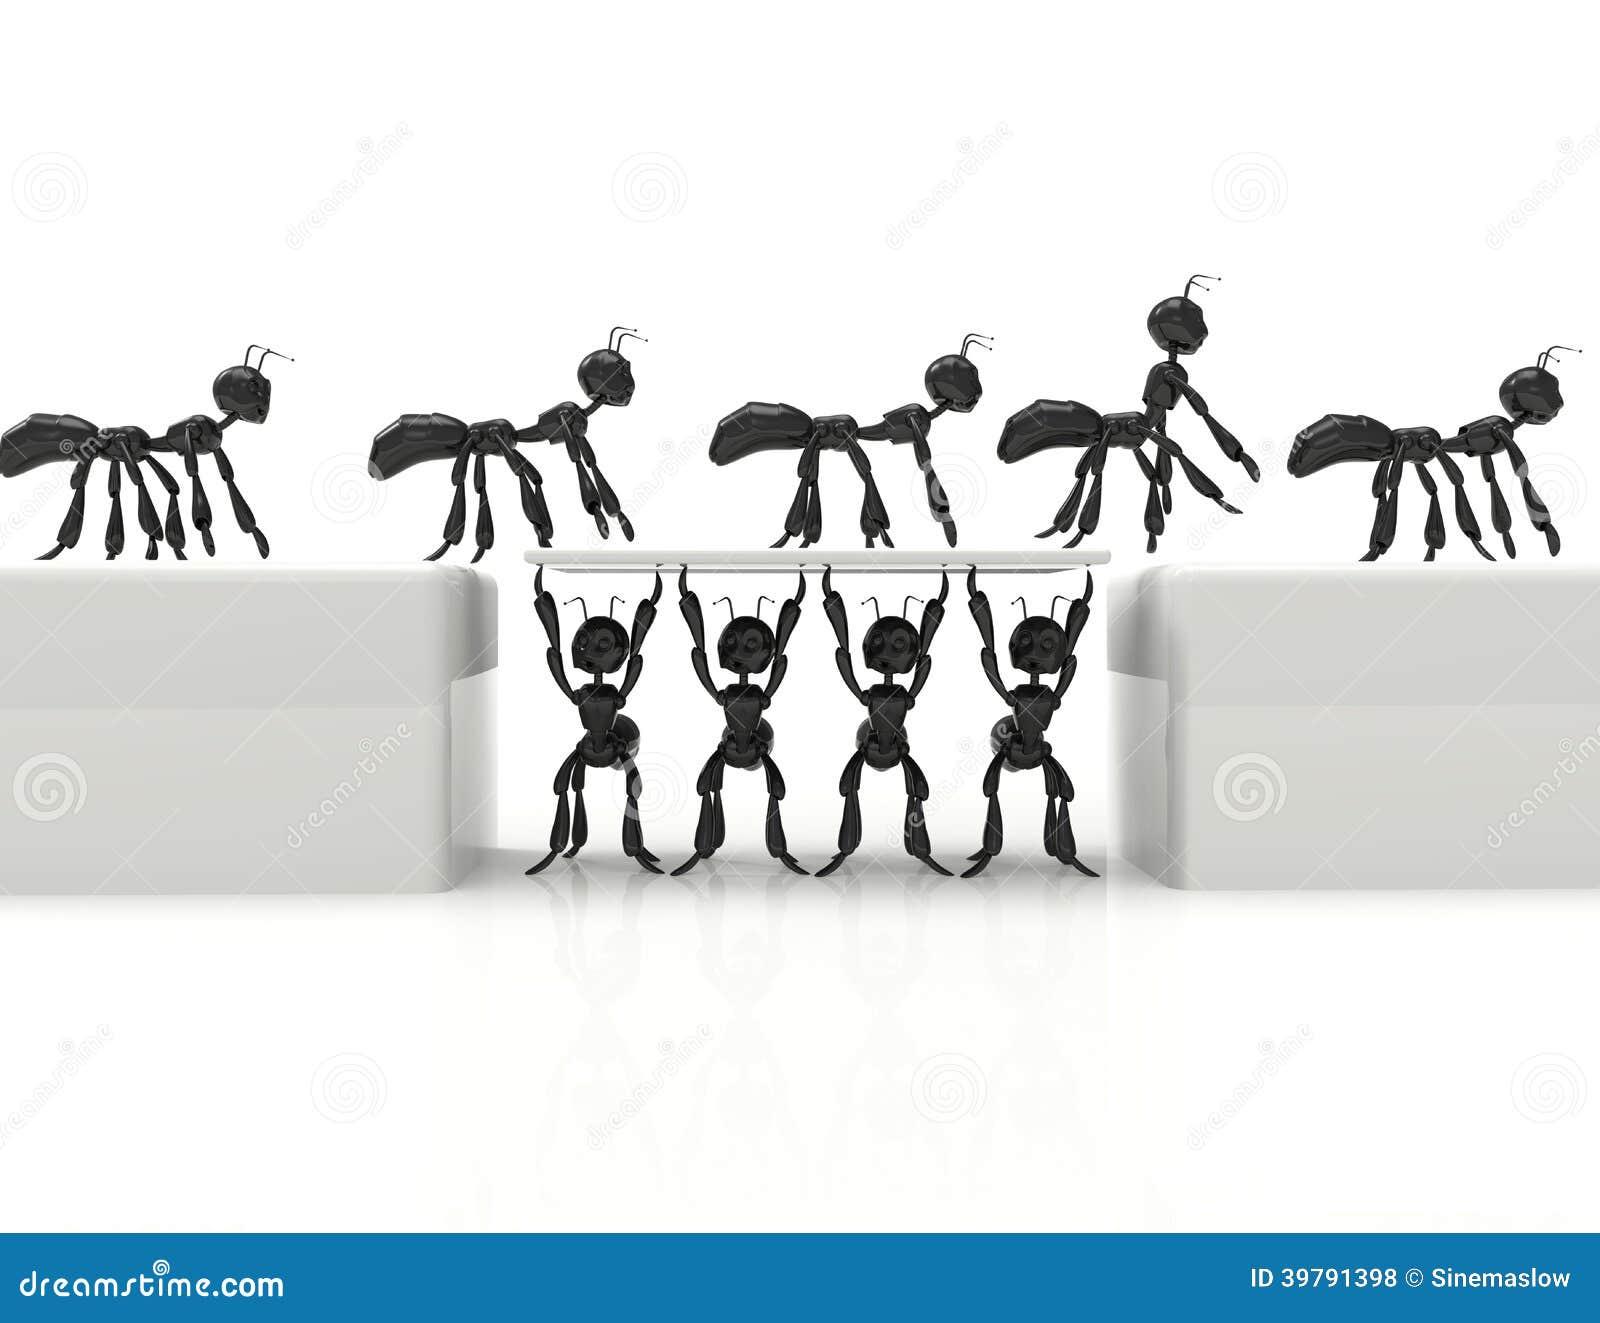 Best Team 3d Cartoon Ants Stock Illustration Image 39791398